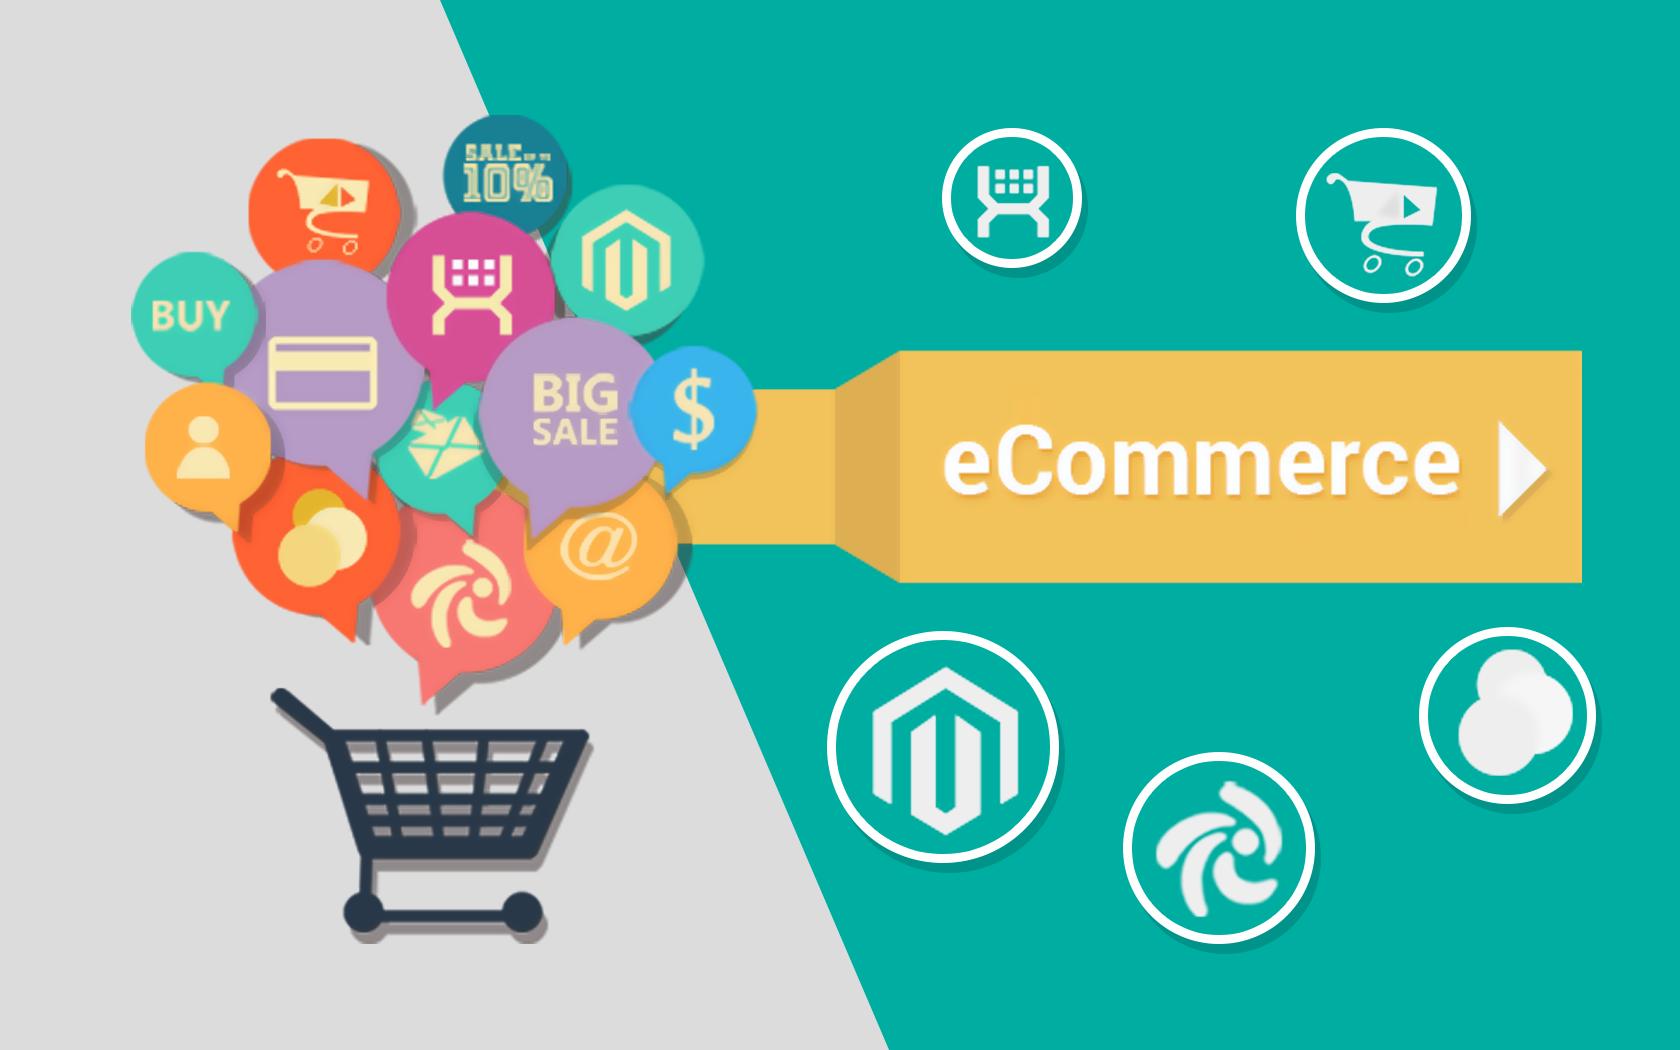 eeebcd57bfce2d Обзор новостей в e-commerce: LeBoutique, EVO, Amazon, Monobank и блокировка  сайтов